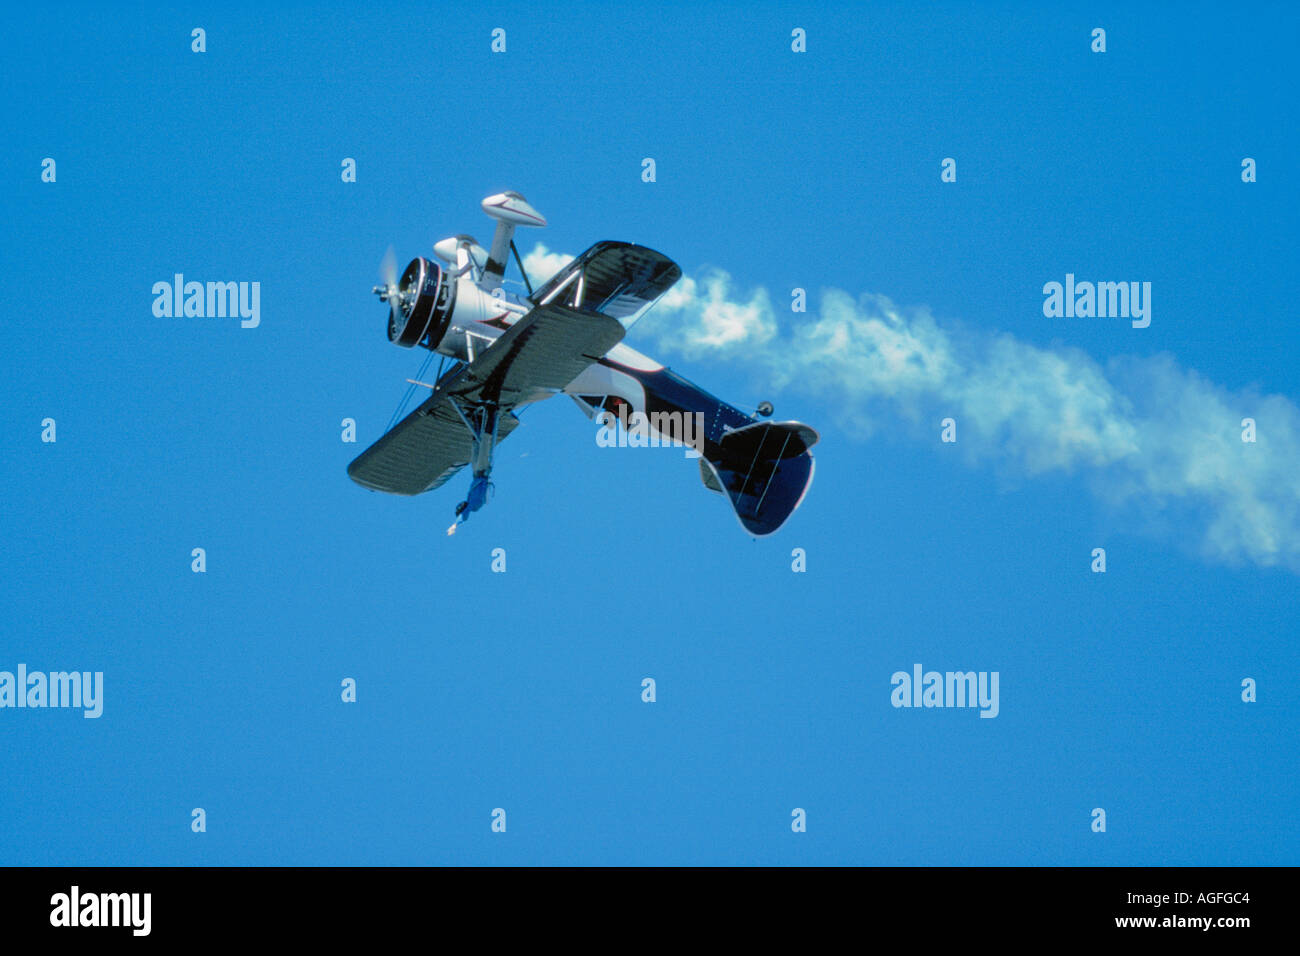 Daring wingwalker upside down during aerial performance - Stock Image